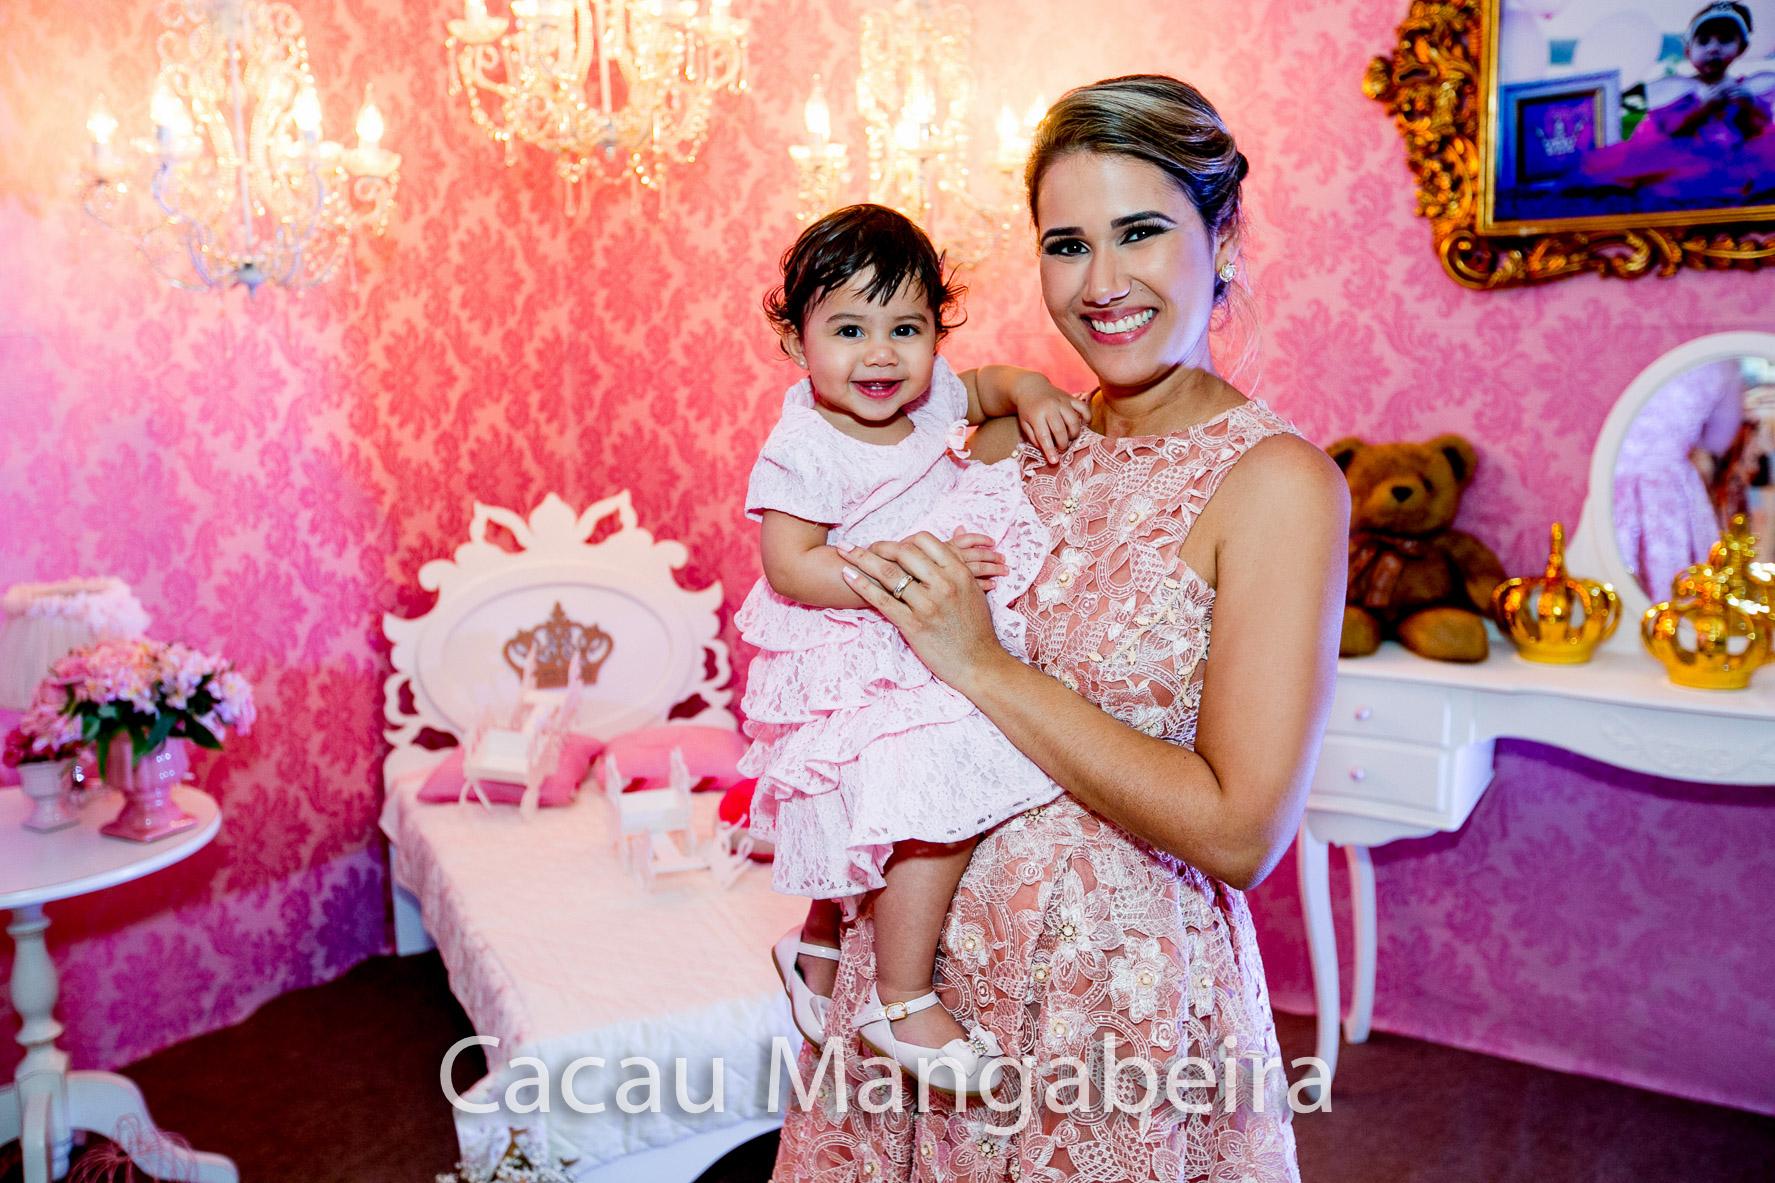 Laura-Cacaumangabeira